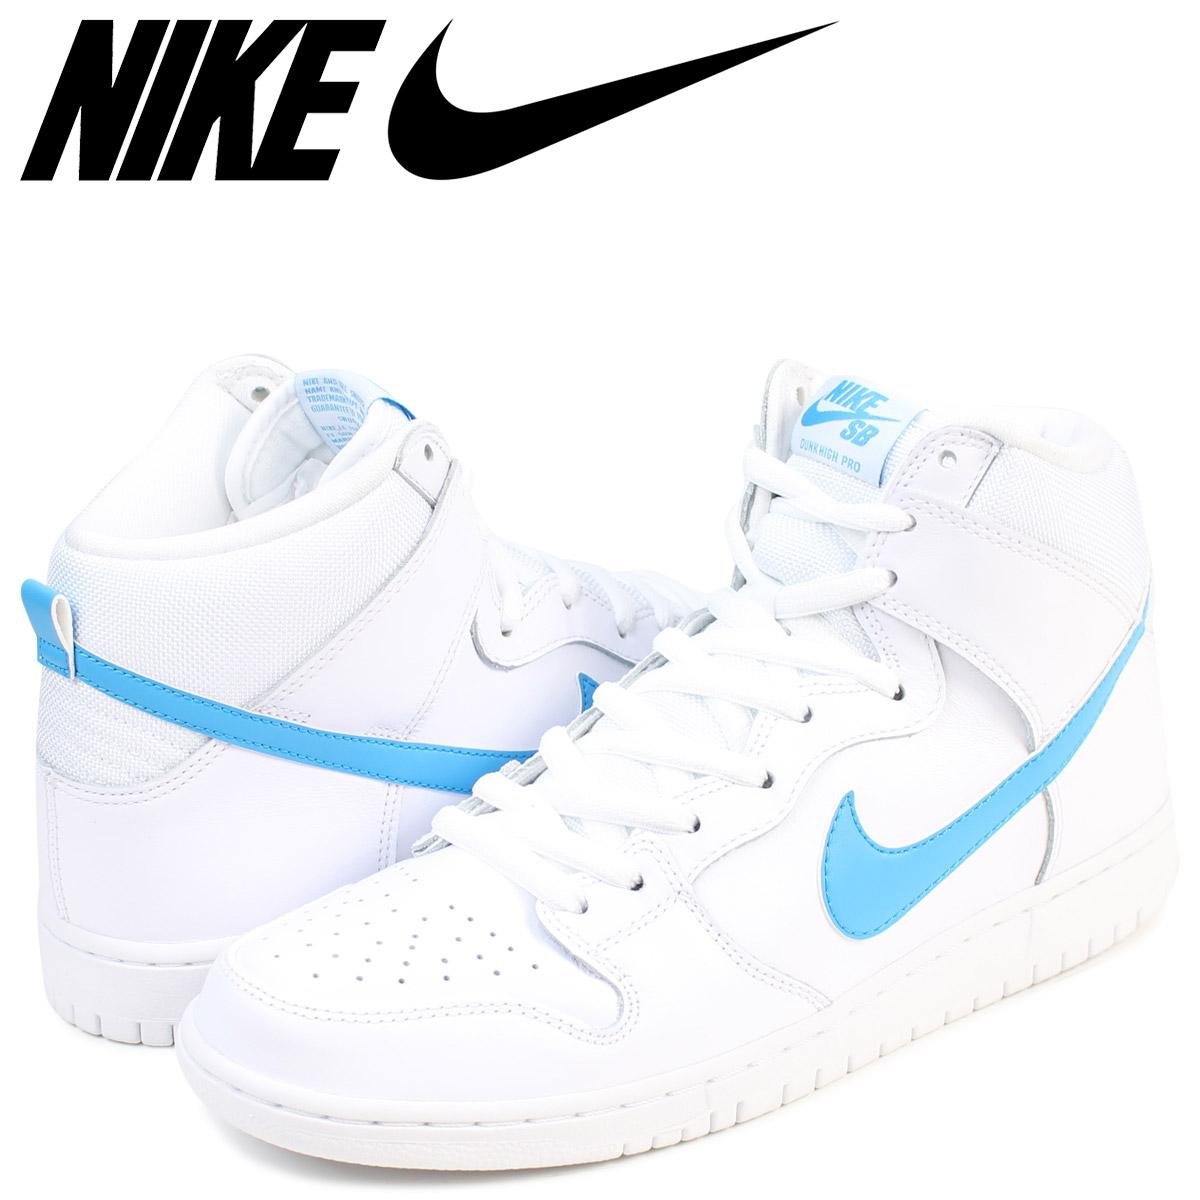 new styles b2f61 491a2 NIKE Nike dunk SB sneakers SB DUNK HIGH TRD QS 881,758-141 men s white white